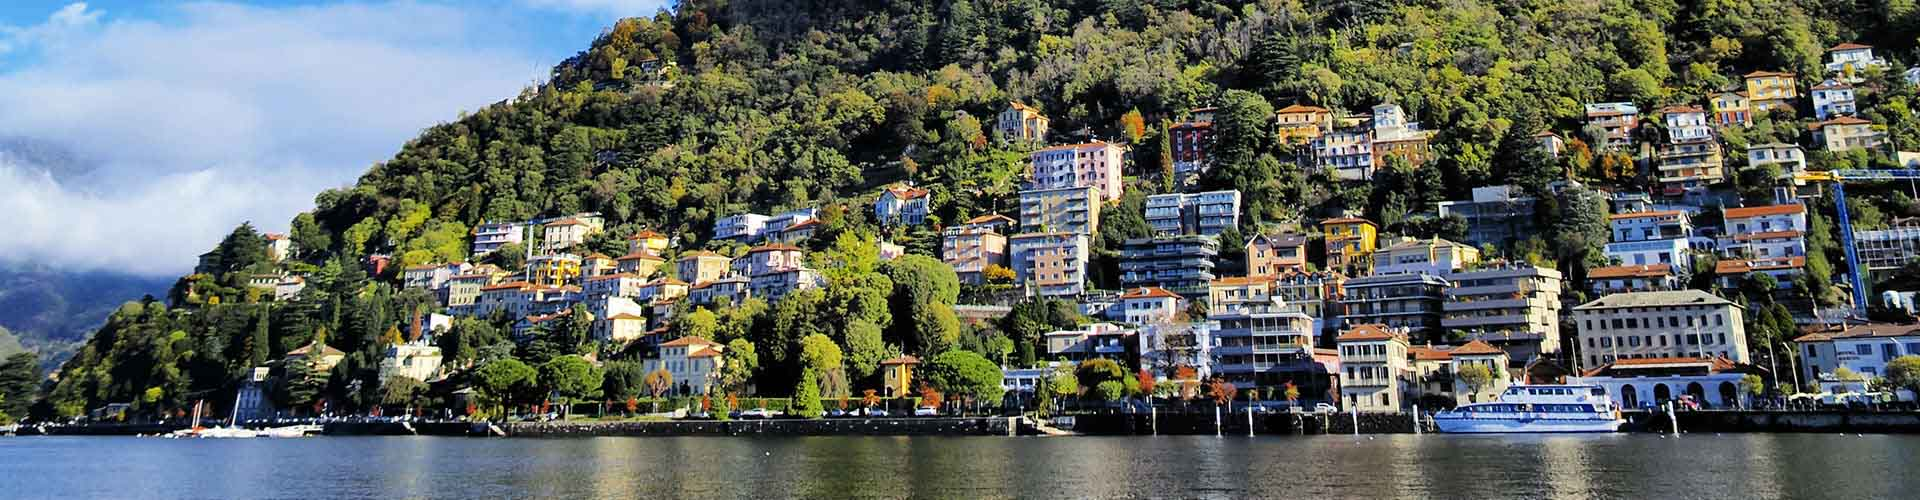 Lago de Como - Apartamentos en Lago de Como. Mapas de Lago de Como, Fotos y comentarios de cada Apartamento en Lago de Como.